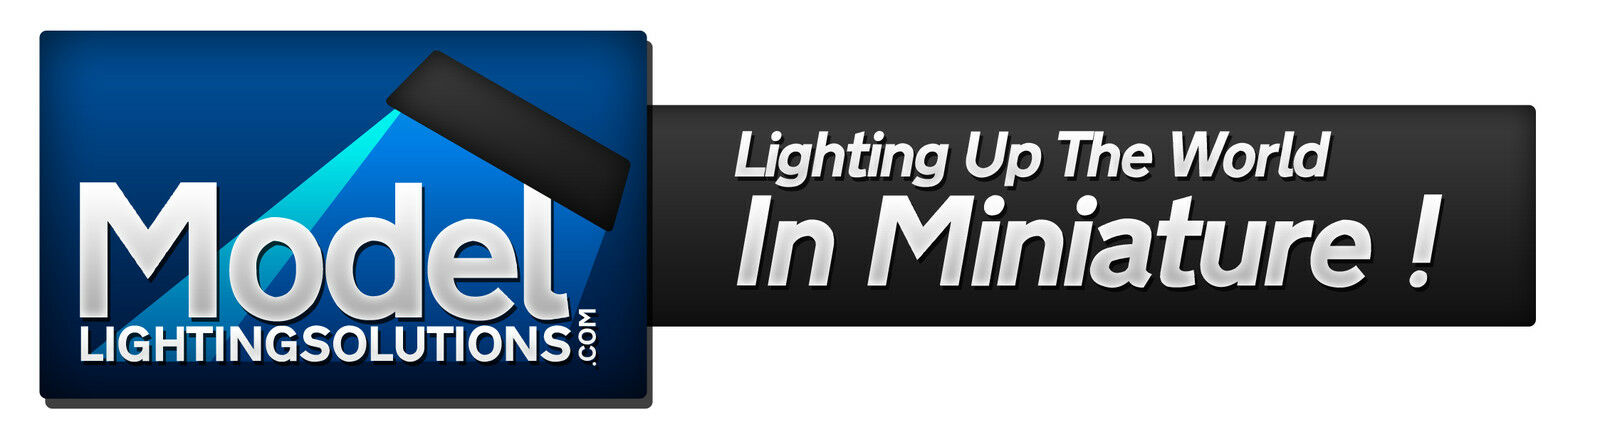 model-lighting-solutions